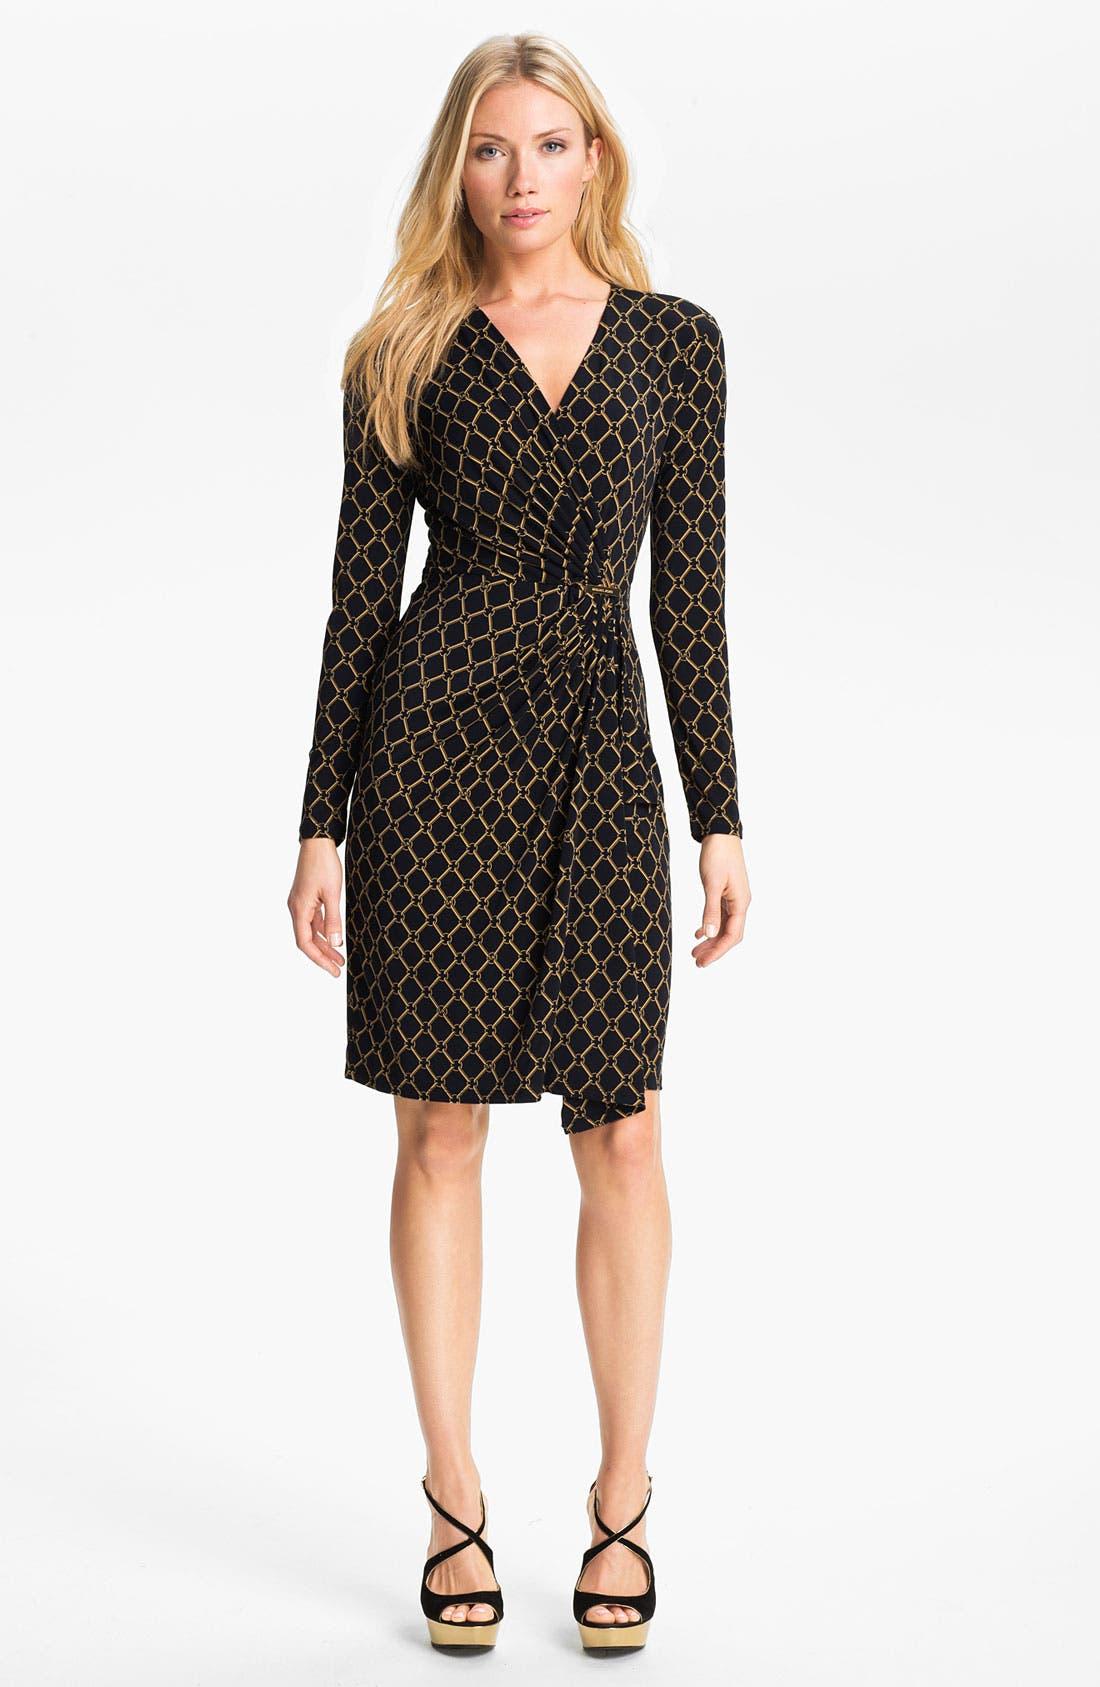 Alternate Image 1 Selected - MICHAEL Michael Kors Chain Print Faux Wrap Dress